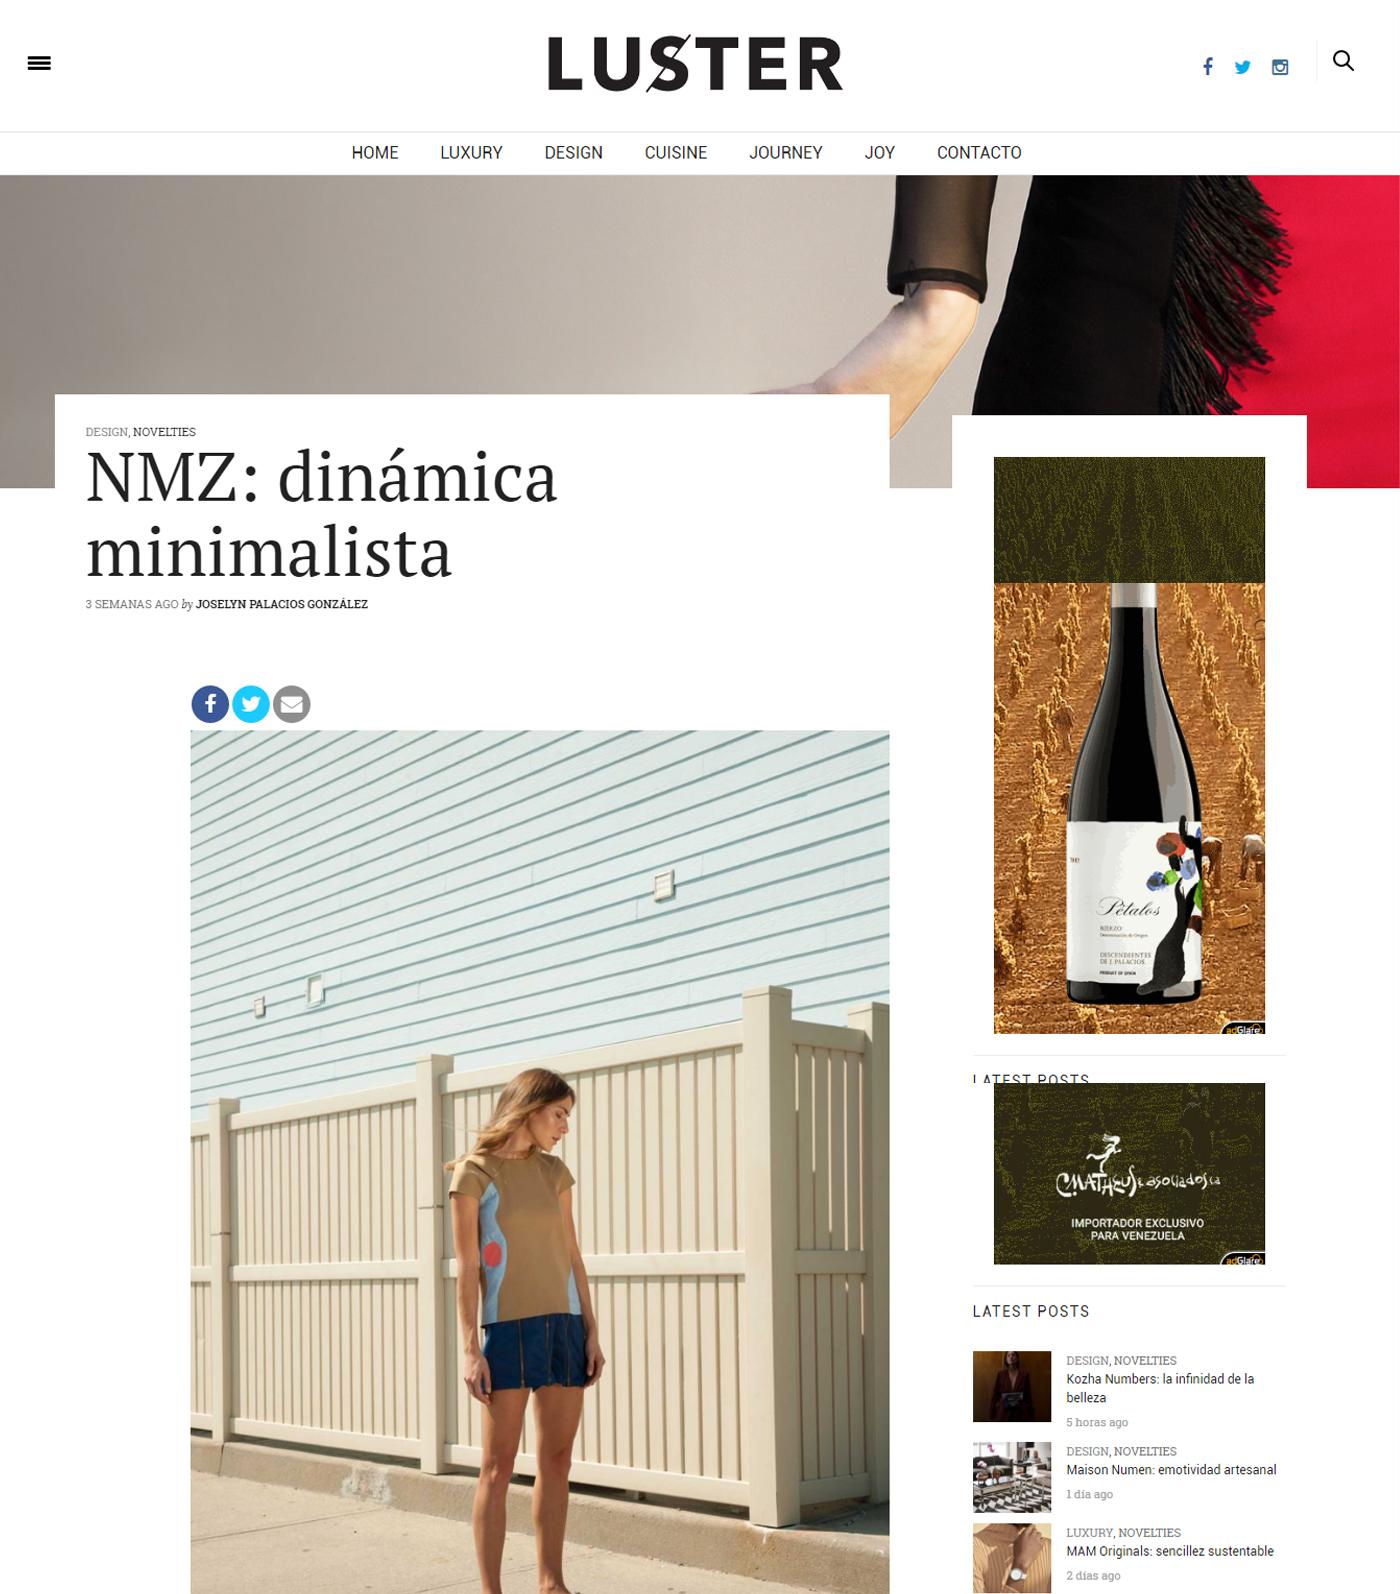 www.lustermagazine.com  - Noviembre 2017